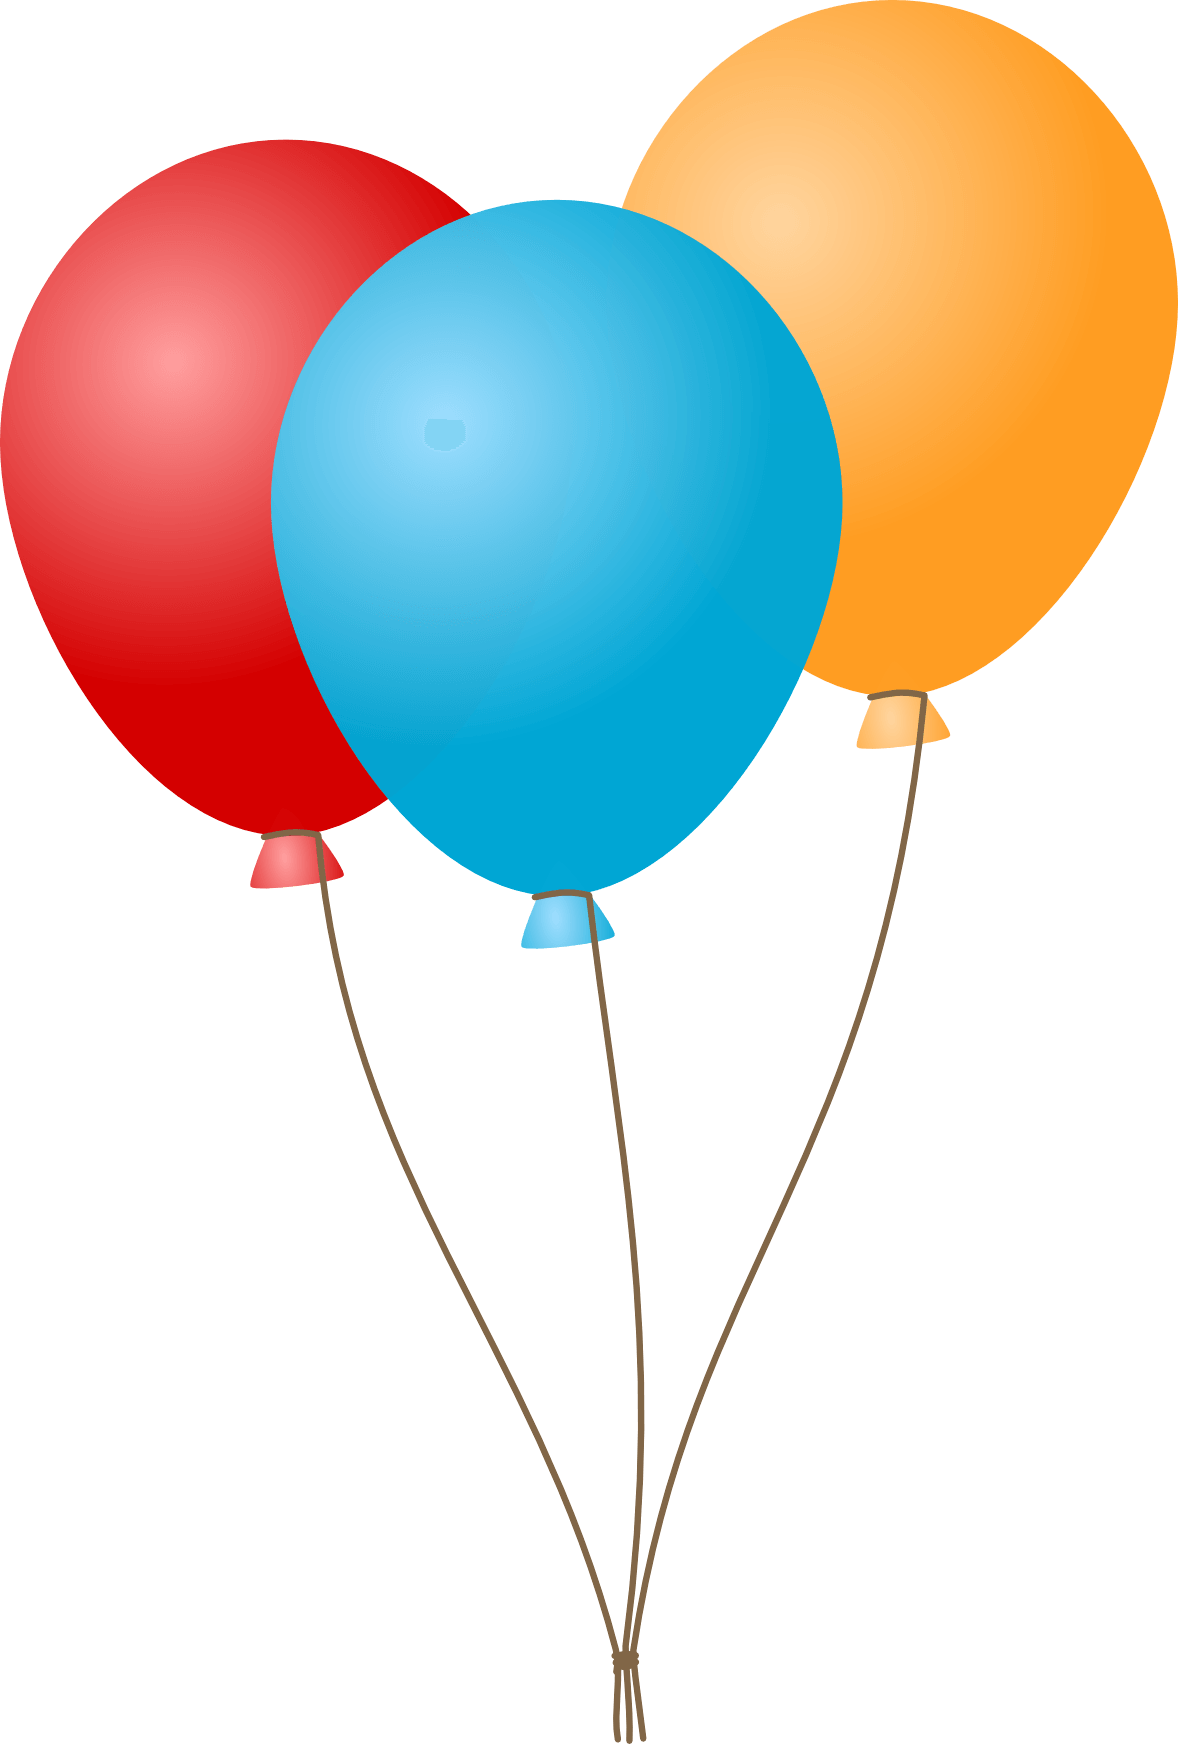 1178x1744 Three Flat Balloons Transparent Png